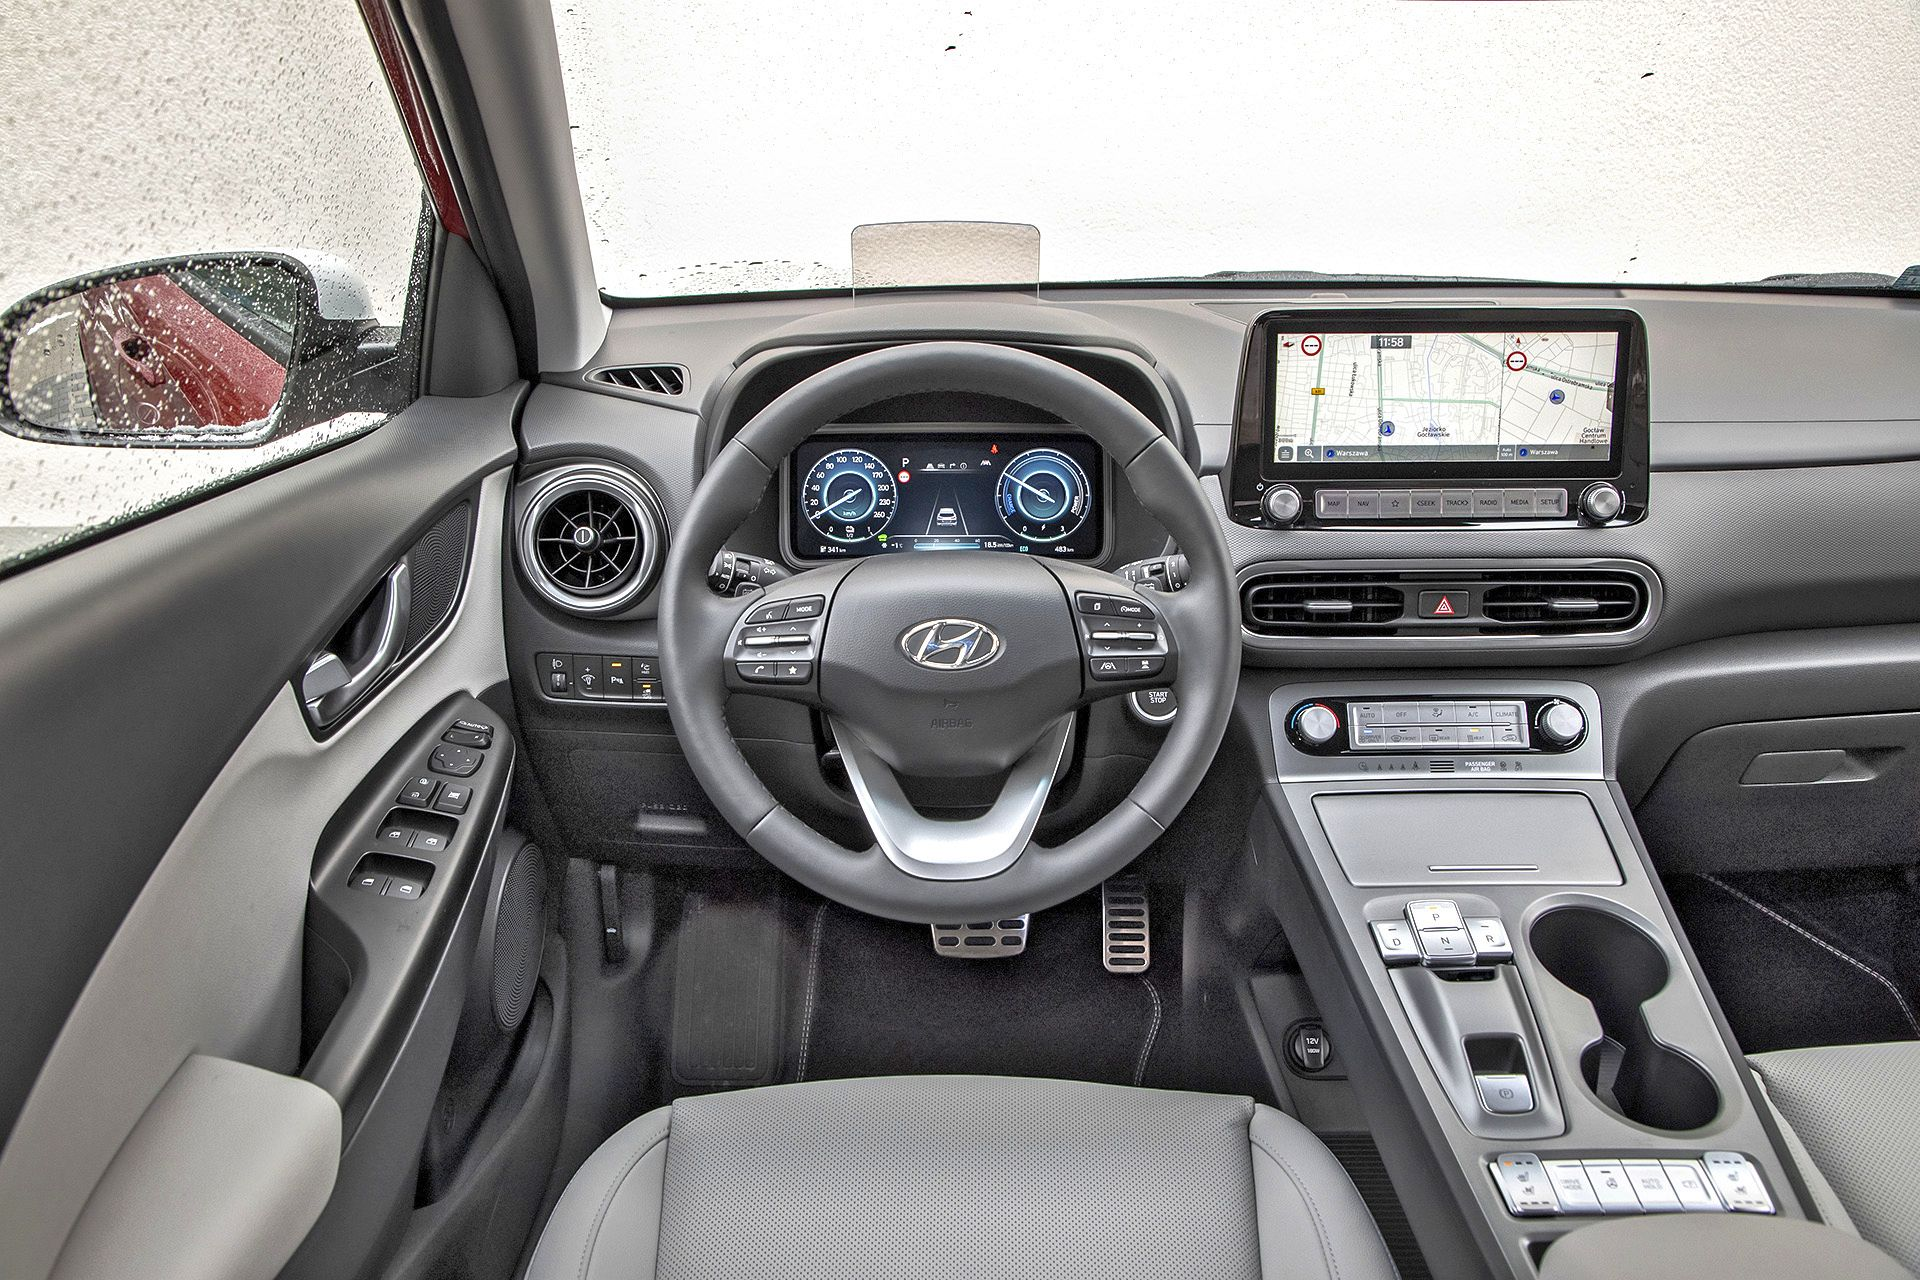 2021 Hyundai Kona electric 64 kWh (5)